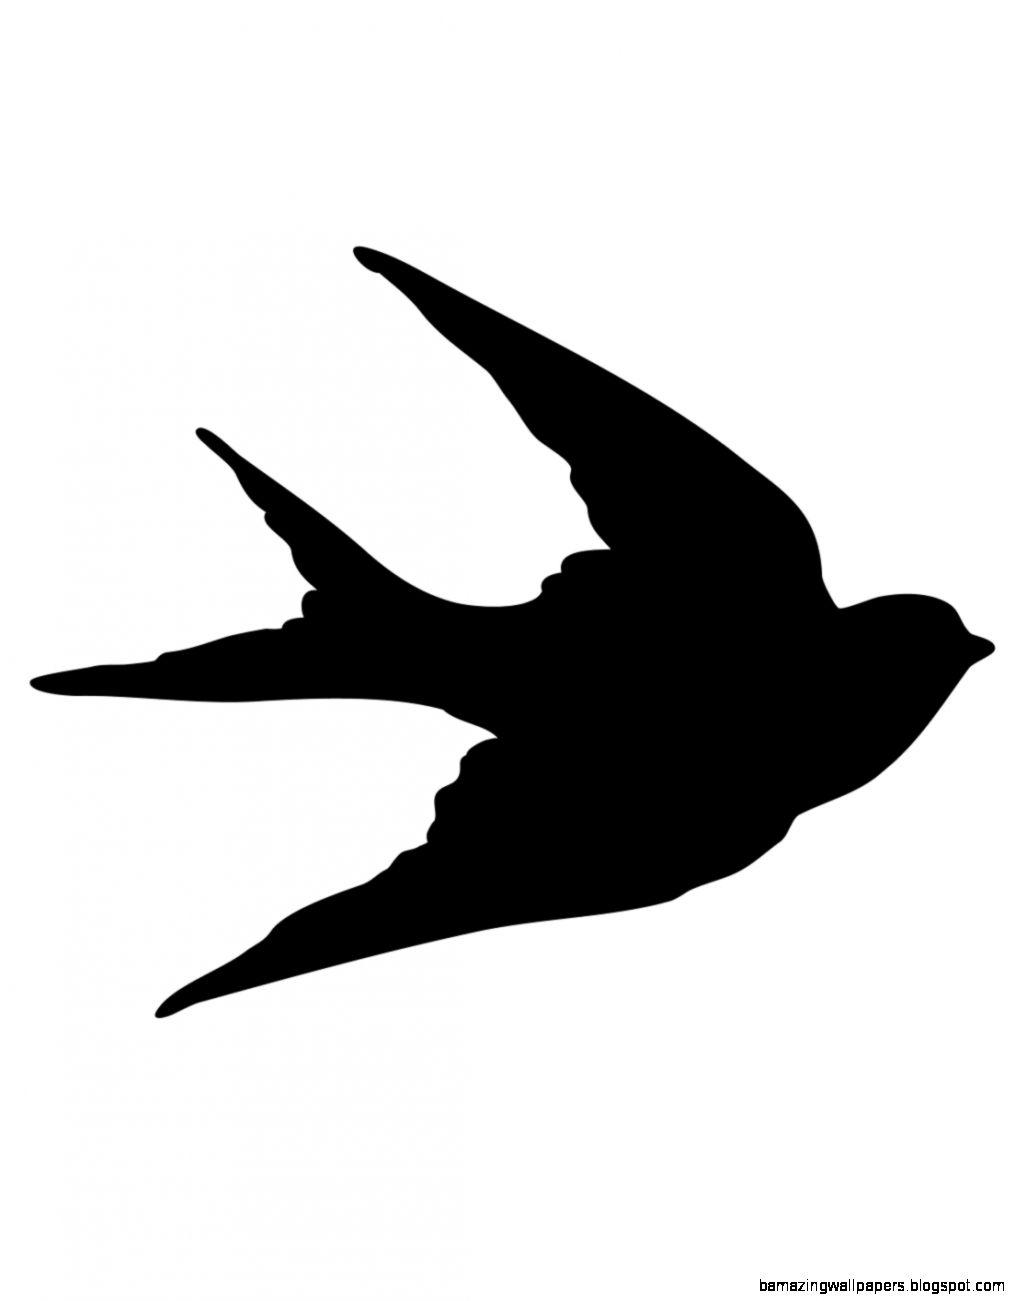 1016x1301 Swallow Silhouette Tattoo Designs